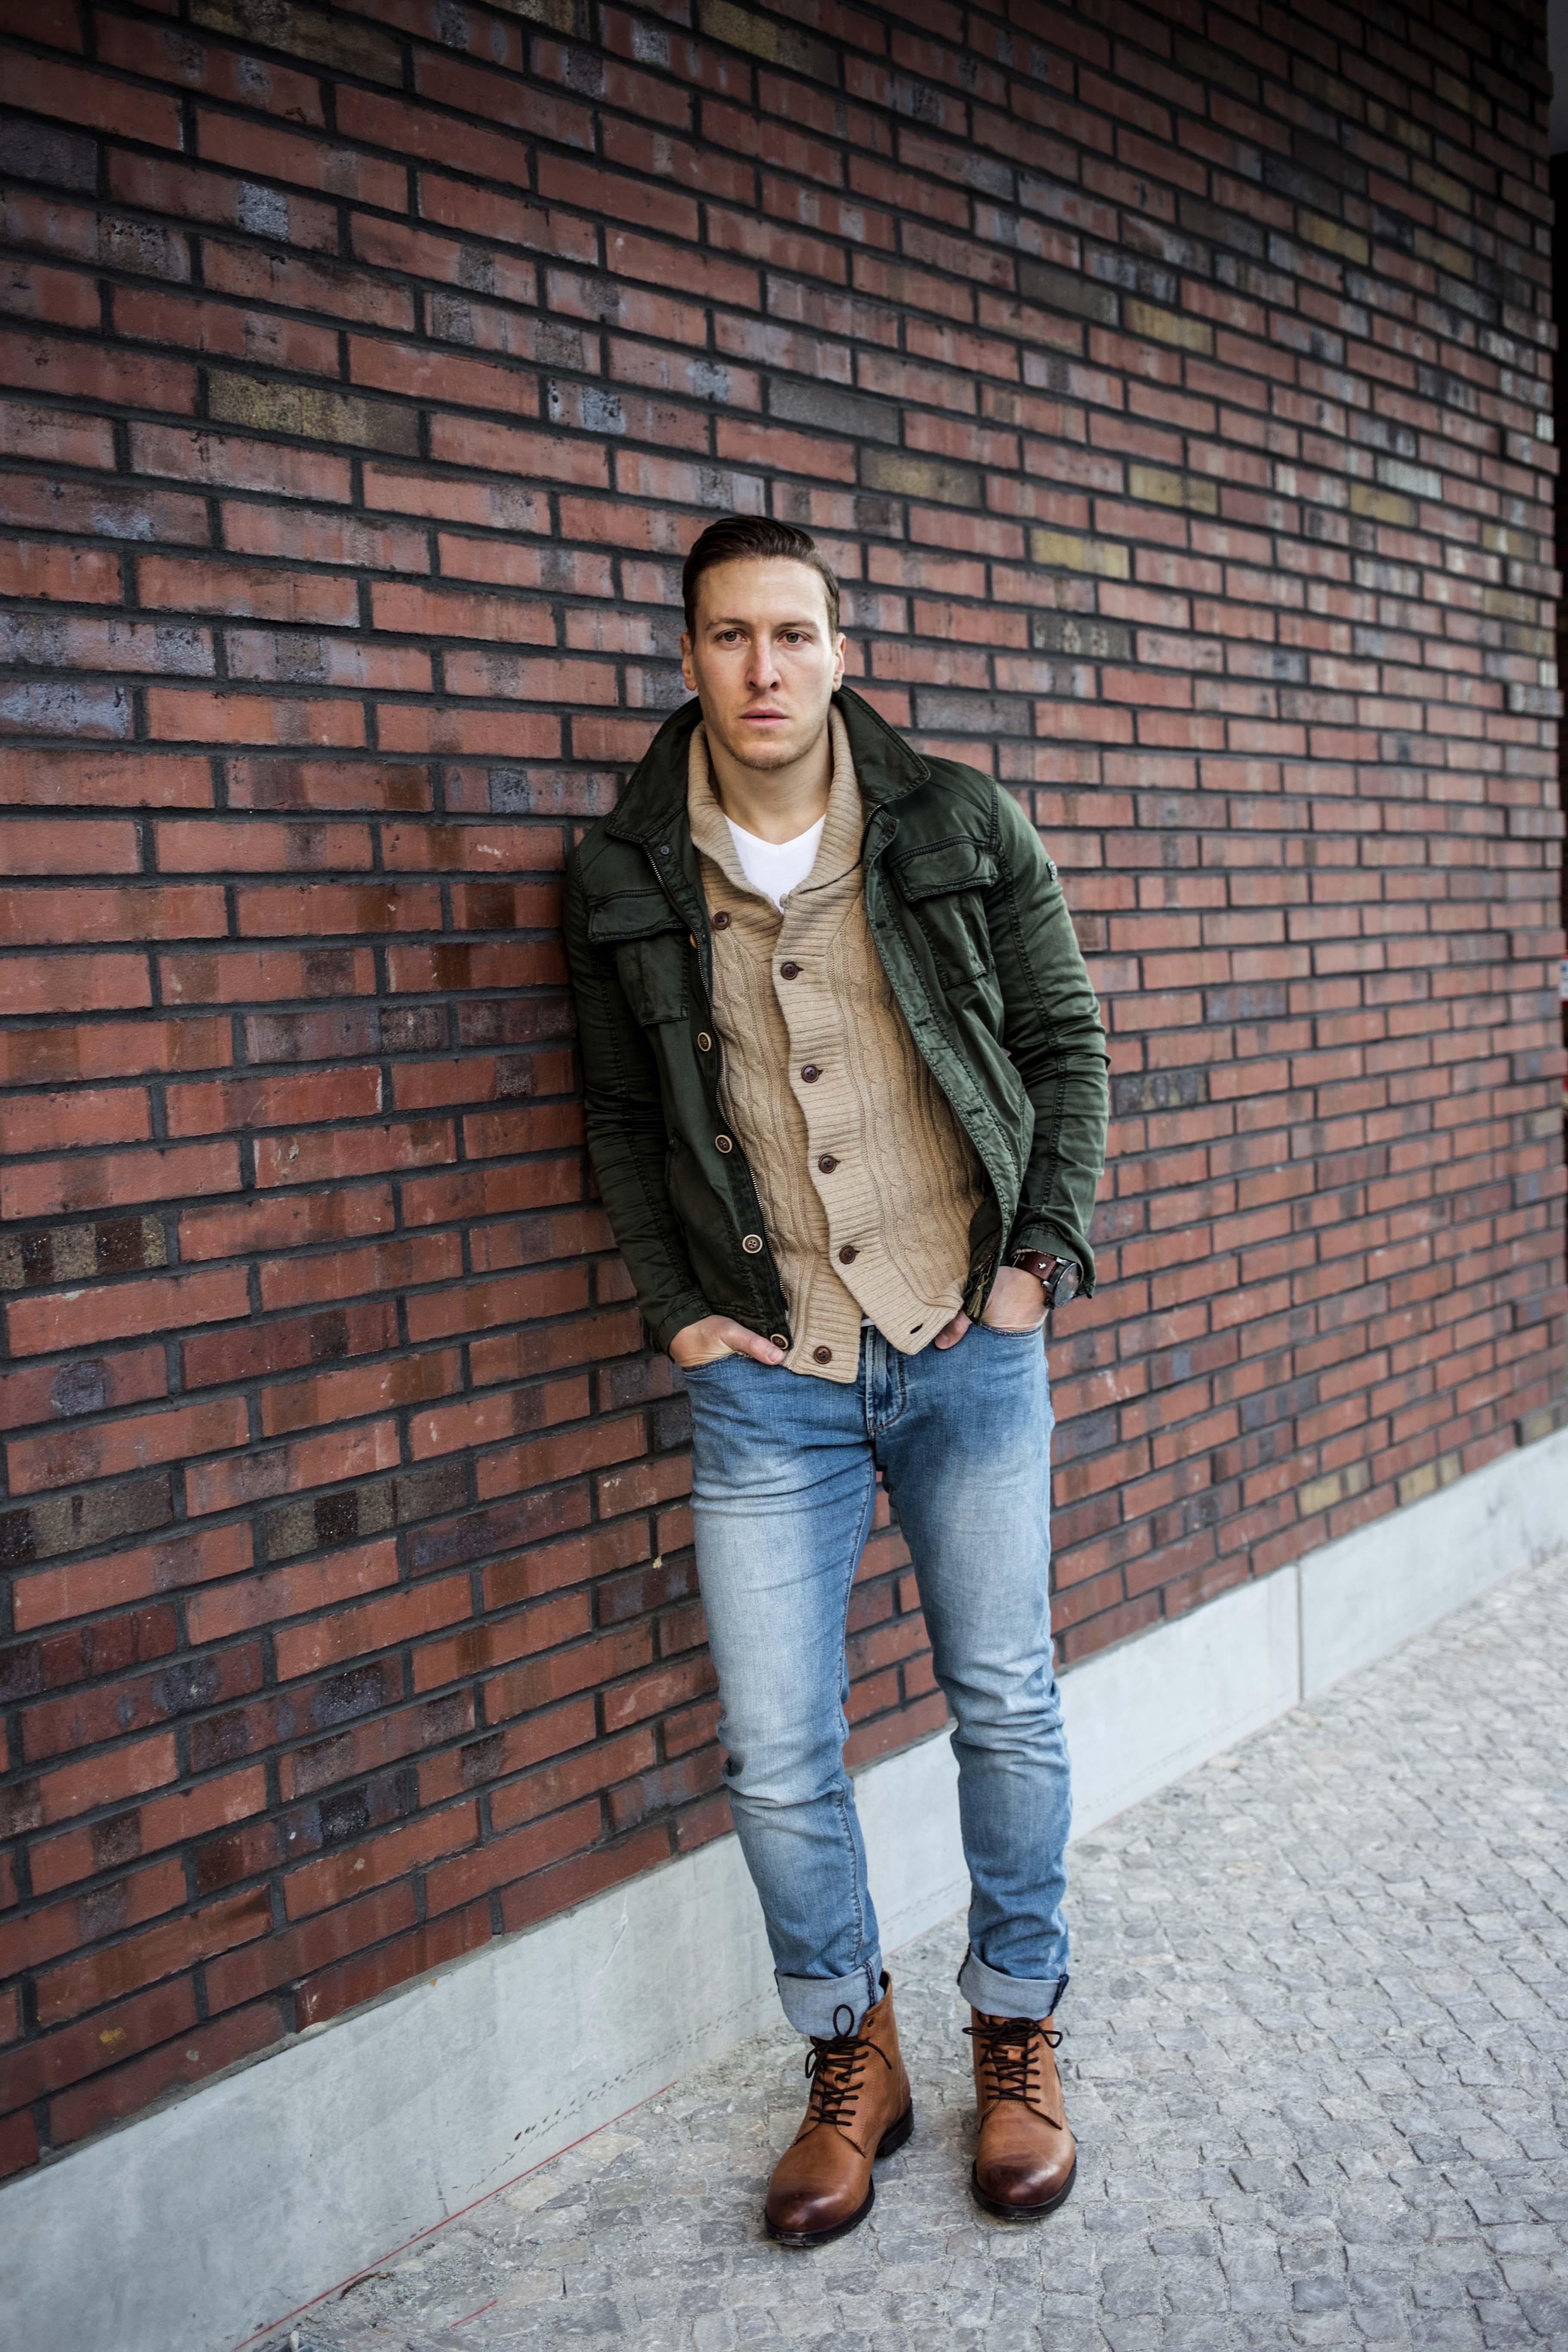 strickjacke-kombinieren-männer-beige-cardigan-blue-jeans-fashionblog-berlin-modeblog_9051